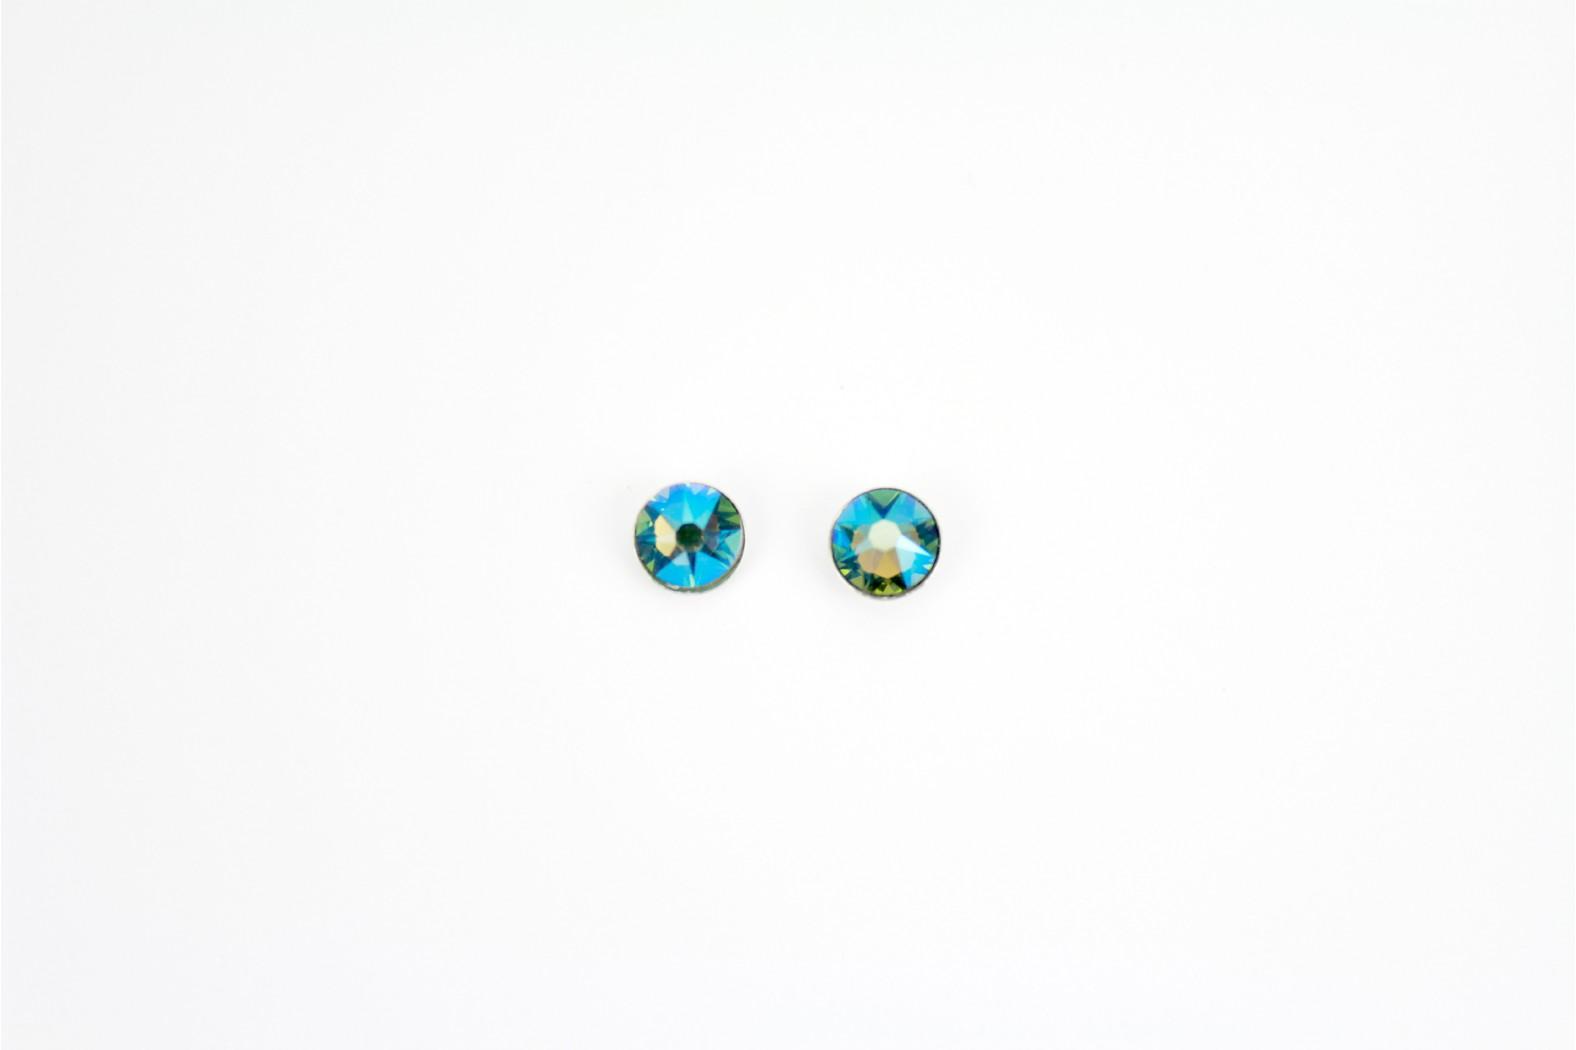 Verifiable Swarovski Crystal stud earrings. Erinite faceted shaped